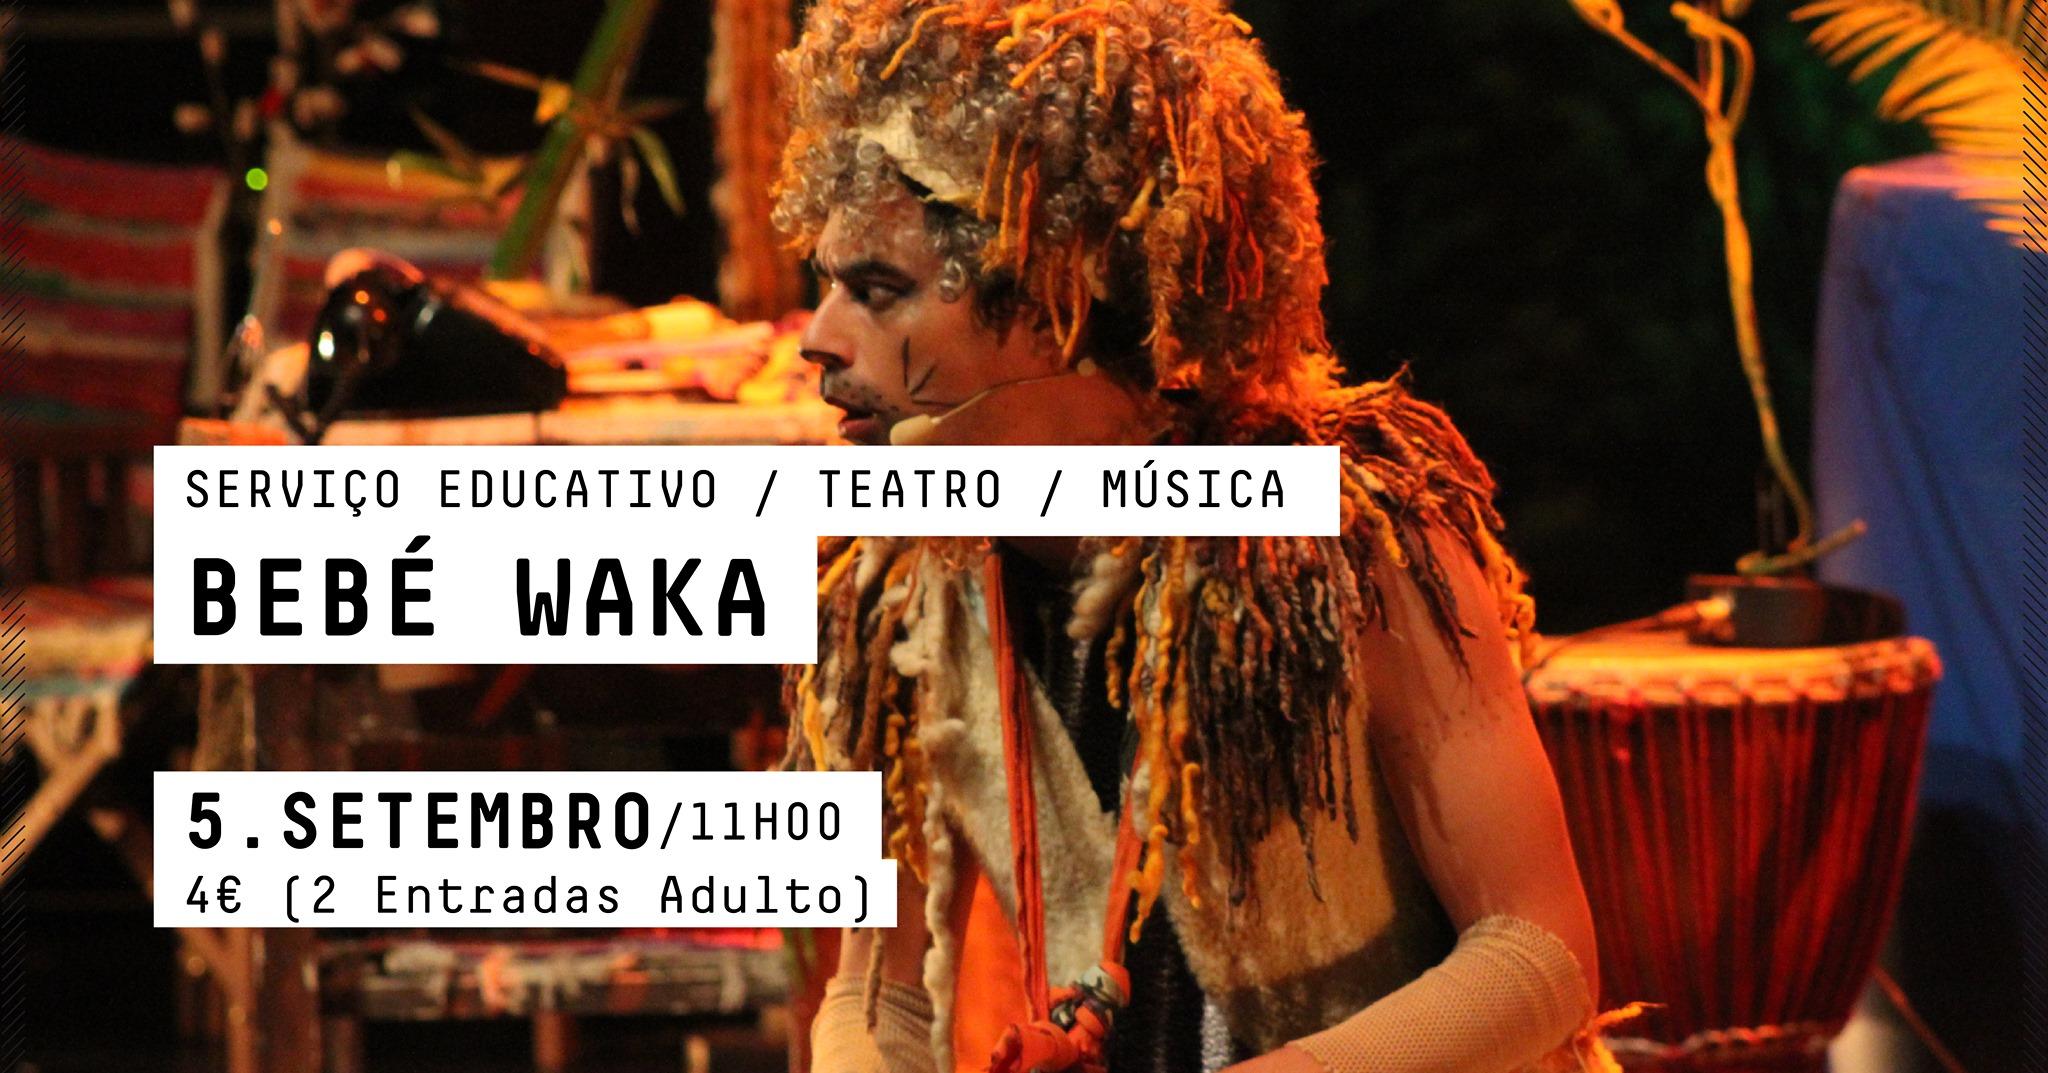 BEBÉ WAKA  - SERVIÇO EDUCATIVO/TEATRO/MÚSICA